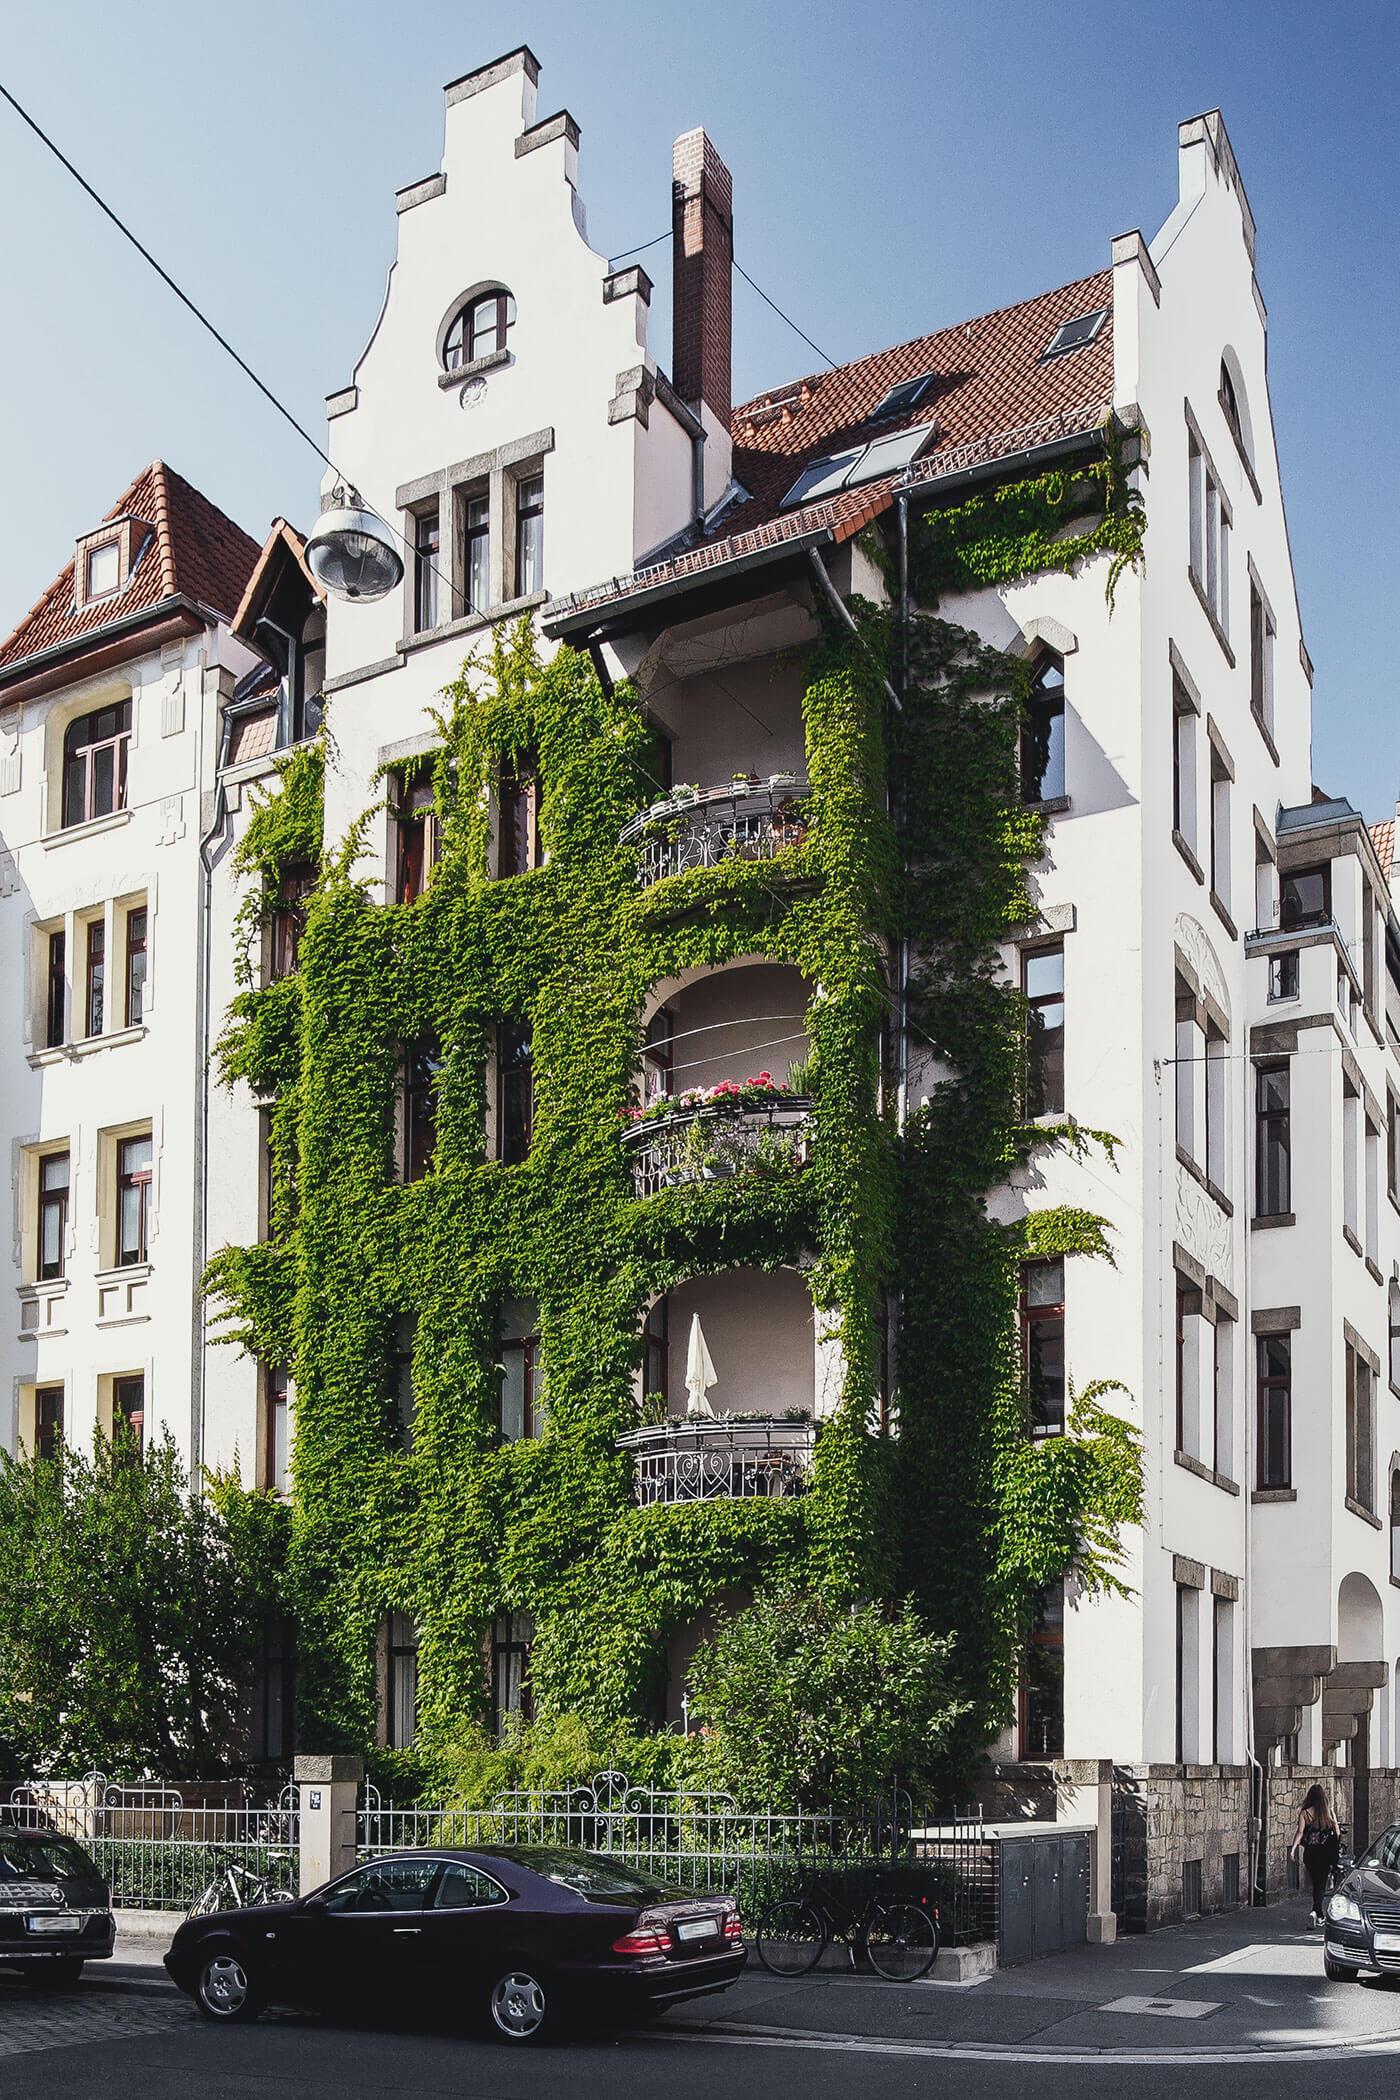 Kollenrodtstraße/Gabelsberger Straße